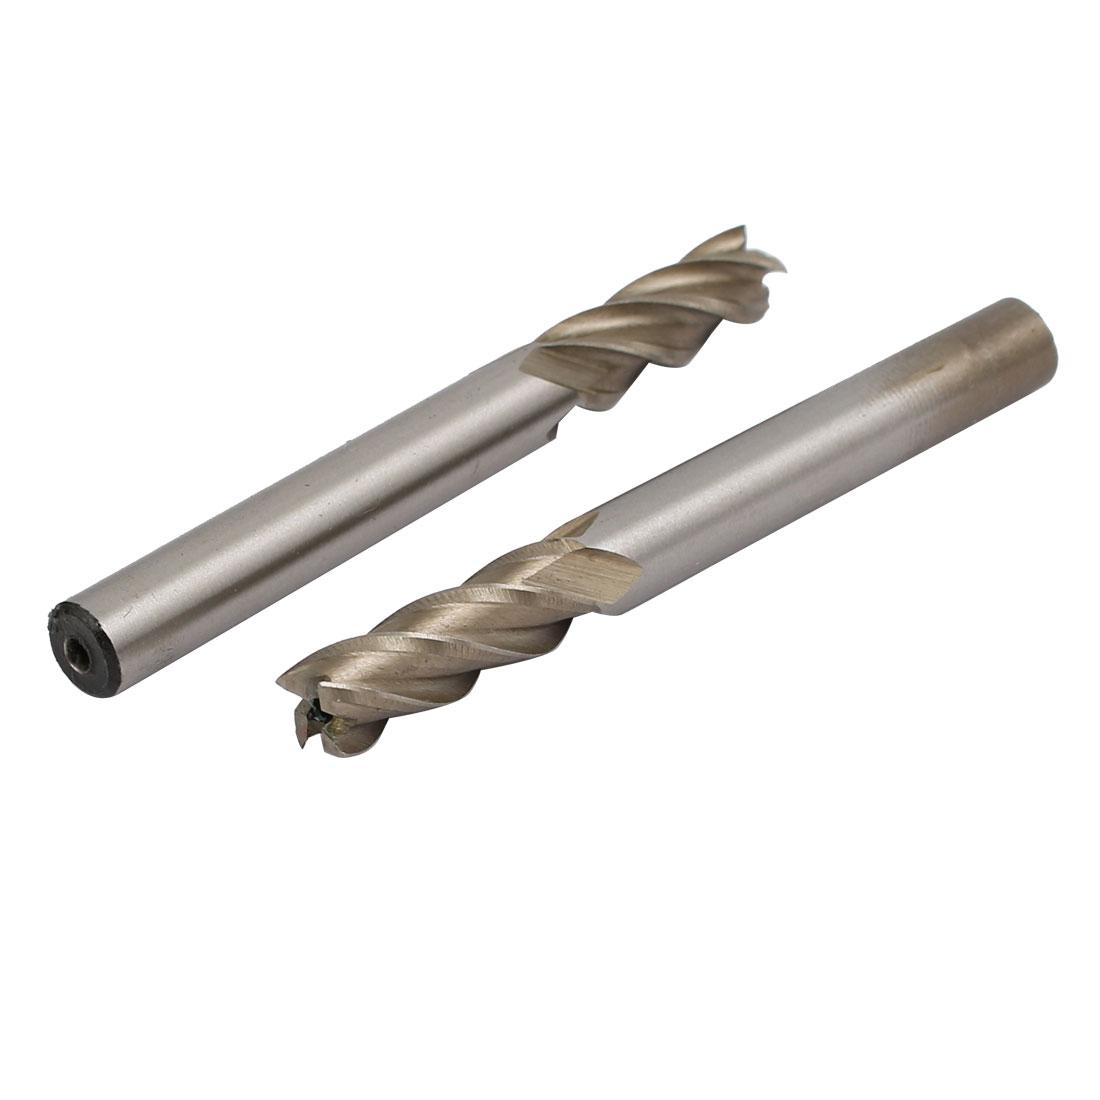 1/4'' Cutting Dia 1/4'' Straight Shank 4 Spiral Flutes End Mill 2pcs